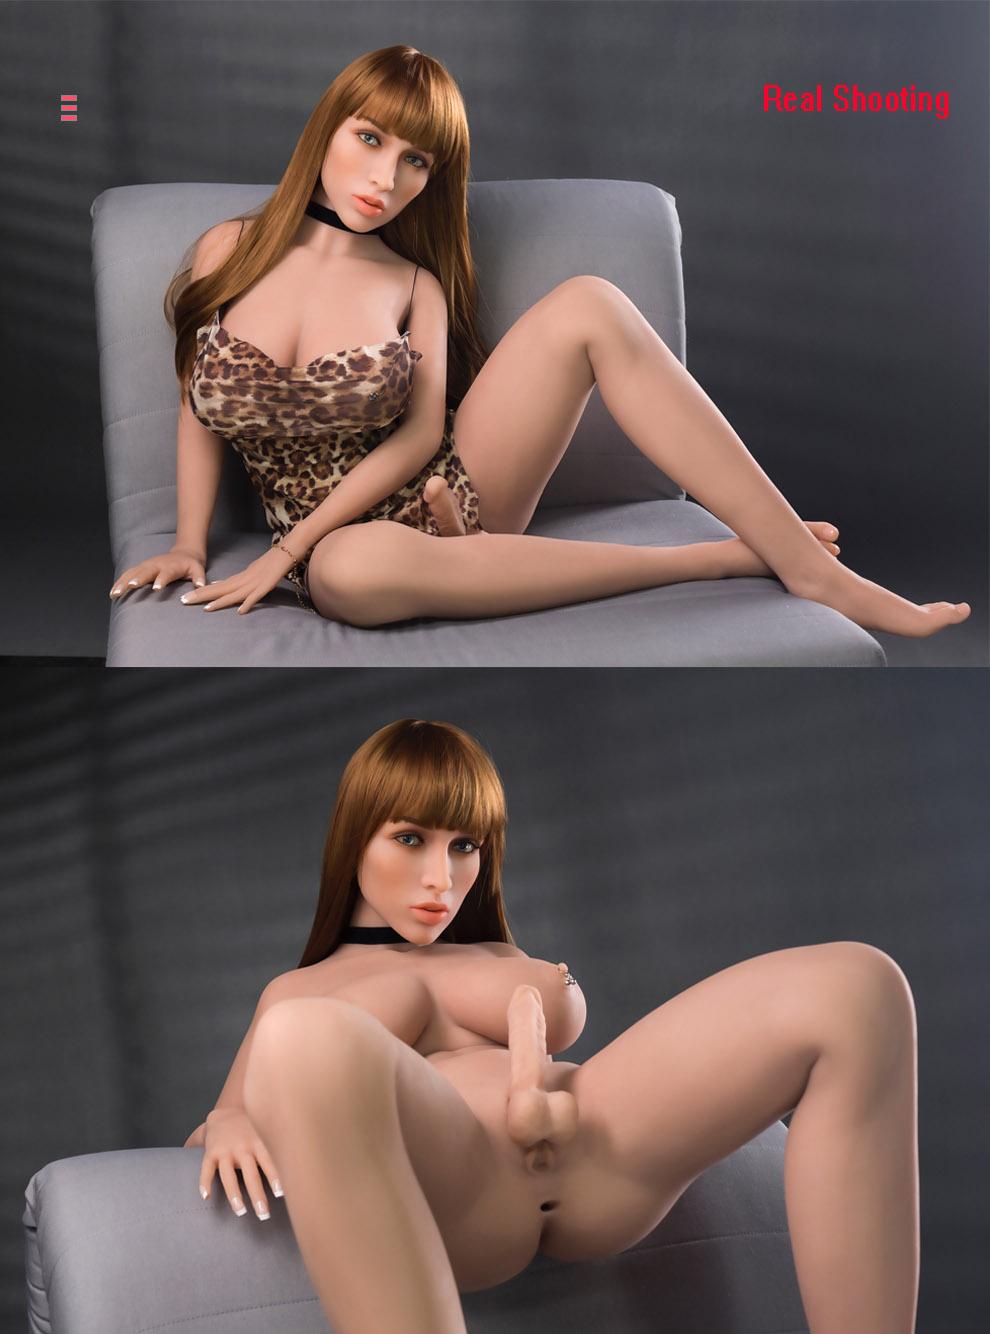 156cm(5.12ft) Transgender Sex Doll And Hermaphrodite Sex Doll